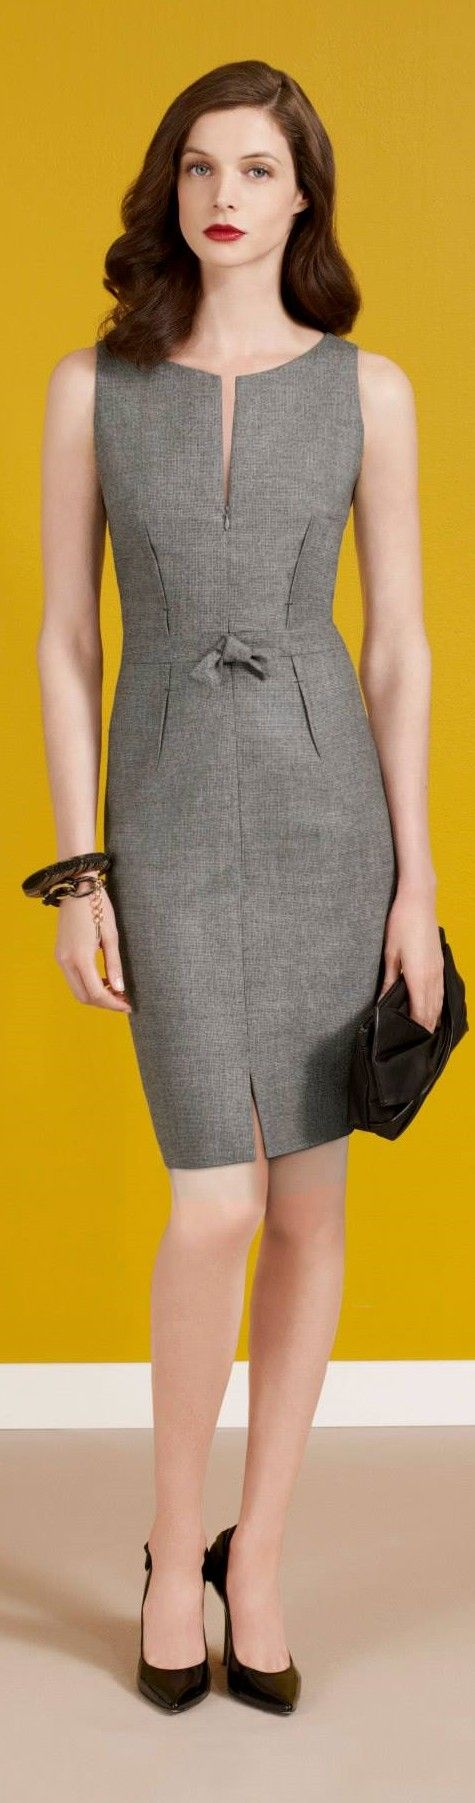 Paule Ka 2015 gray dress. Fall autumn women fashion outfit clothing stylish apparel RORESS closet ideas